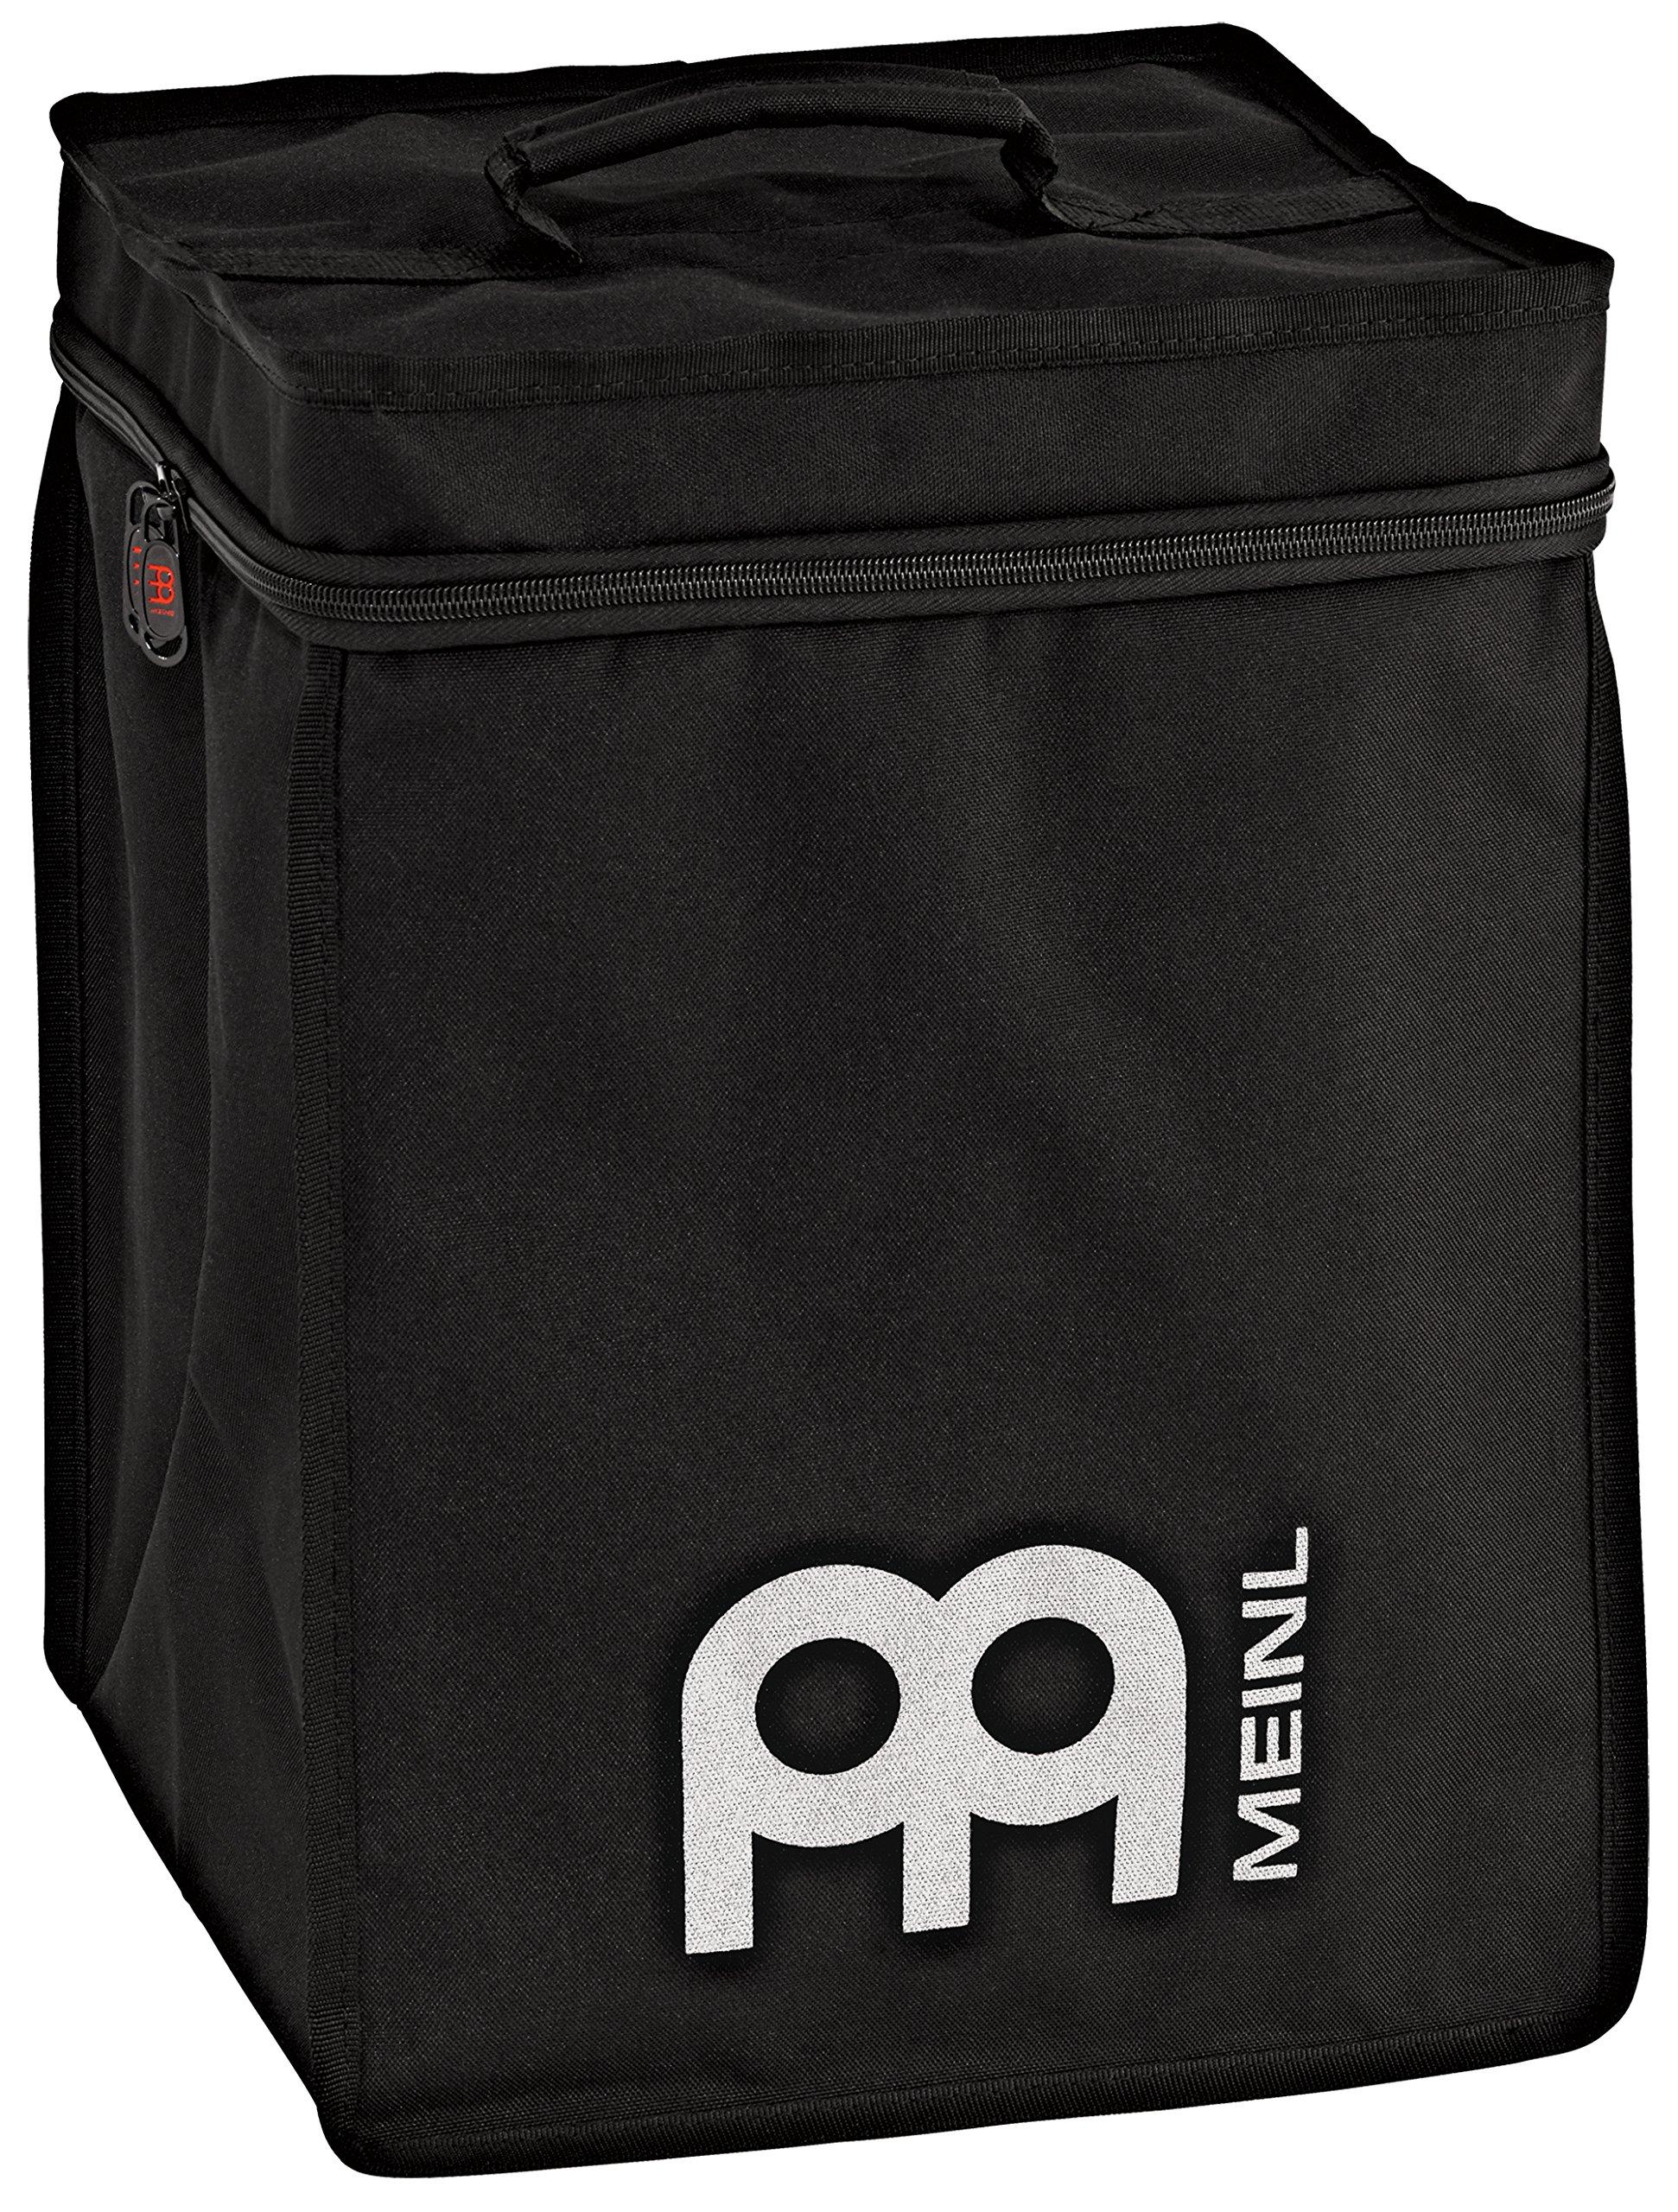 Meinl Percussion Compact Cajon Bag for Meinl Jam Cajons Only (MSTJCJB)